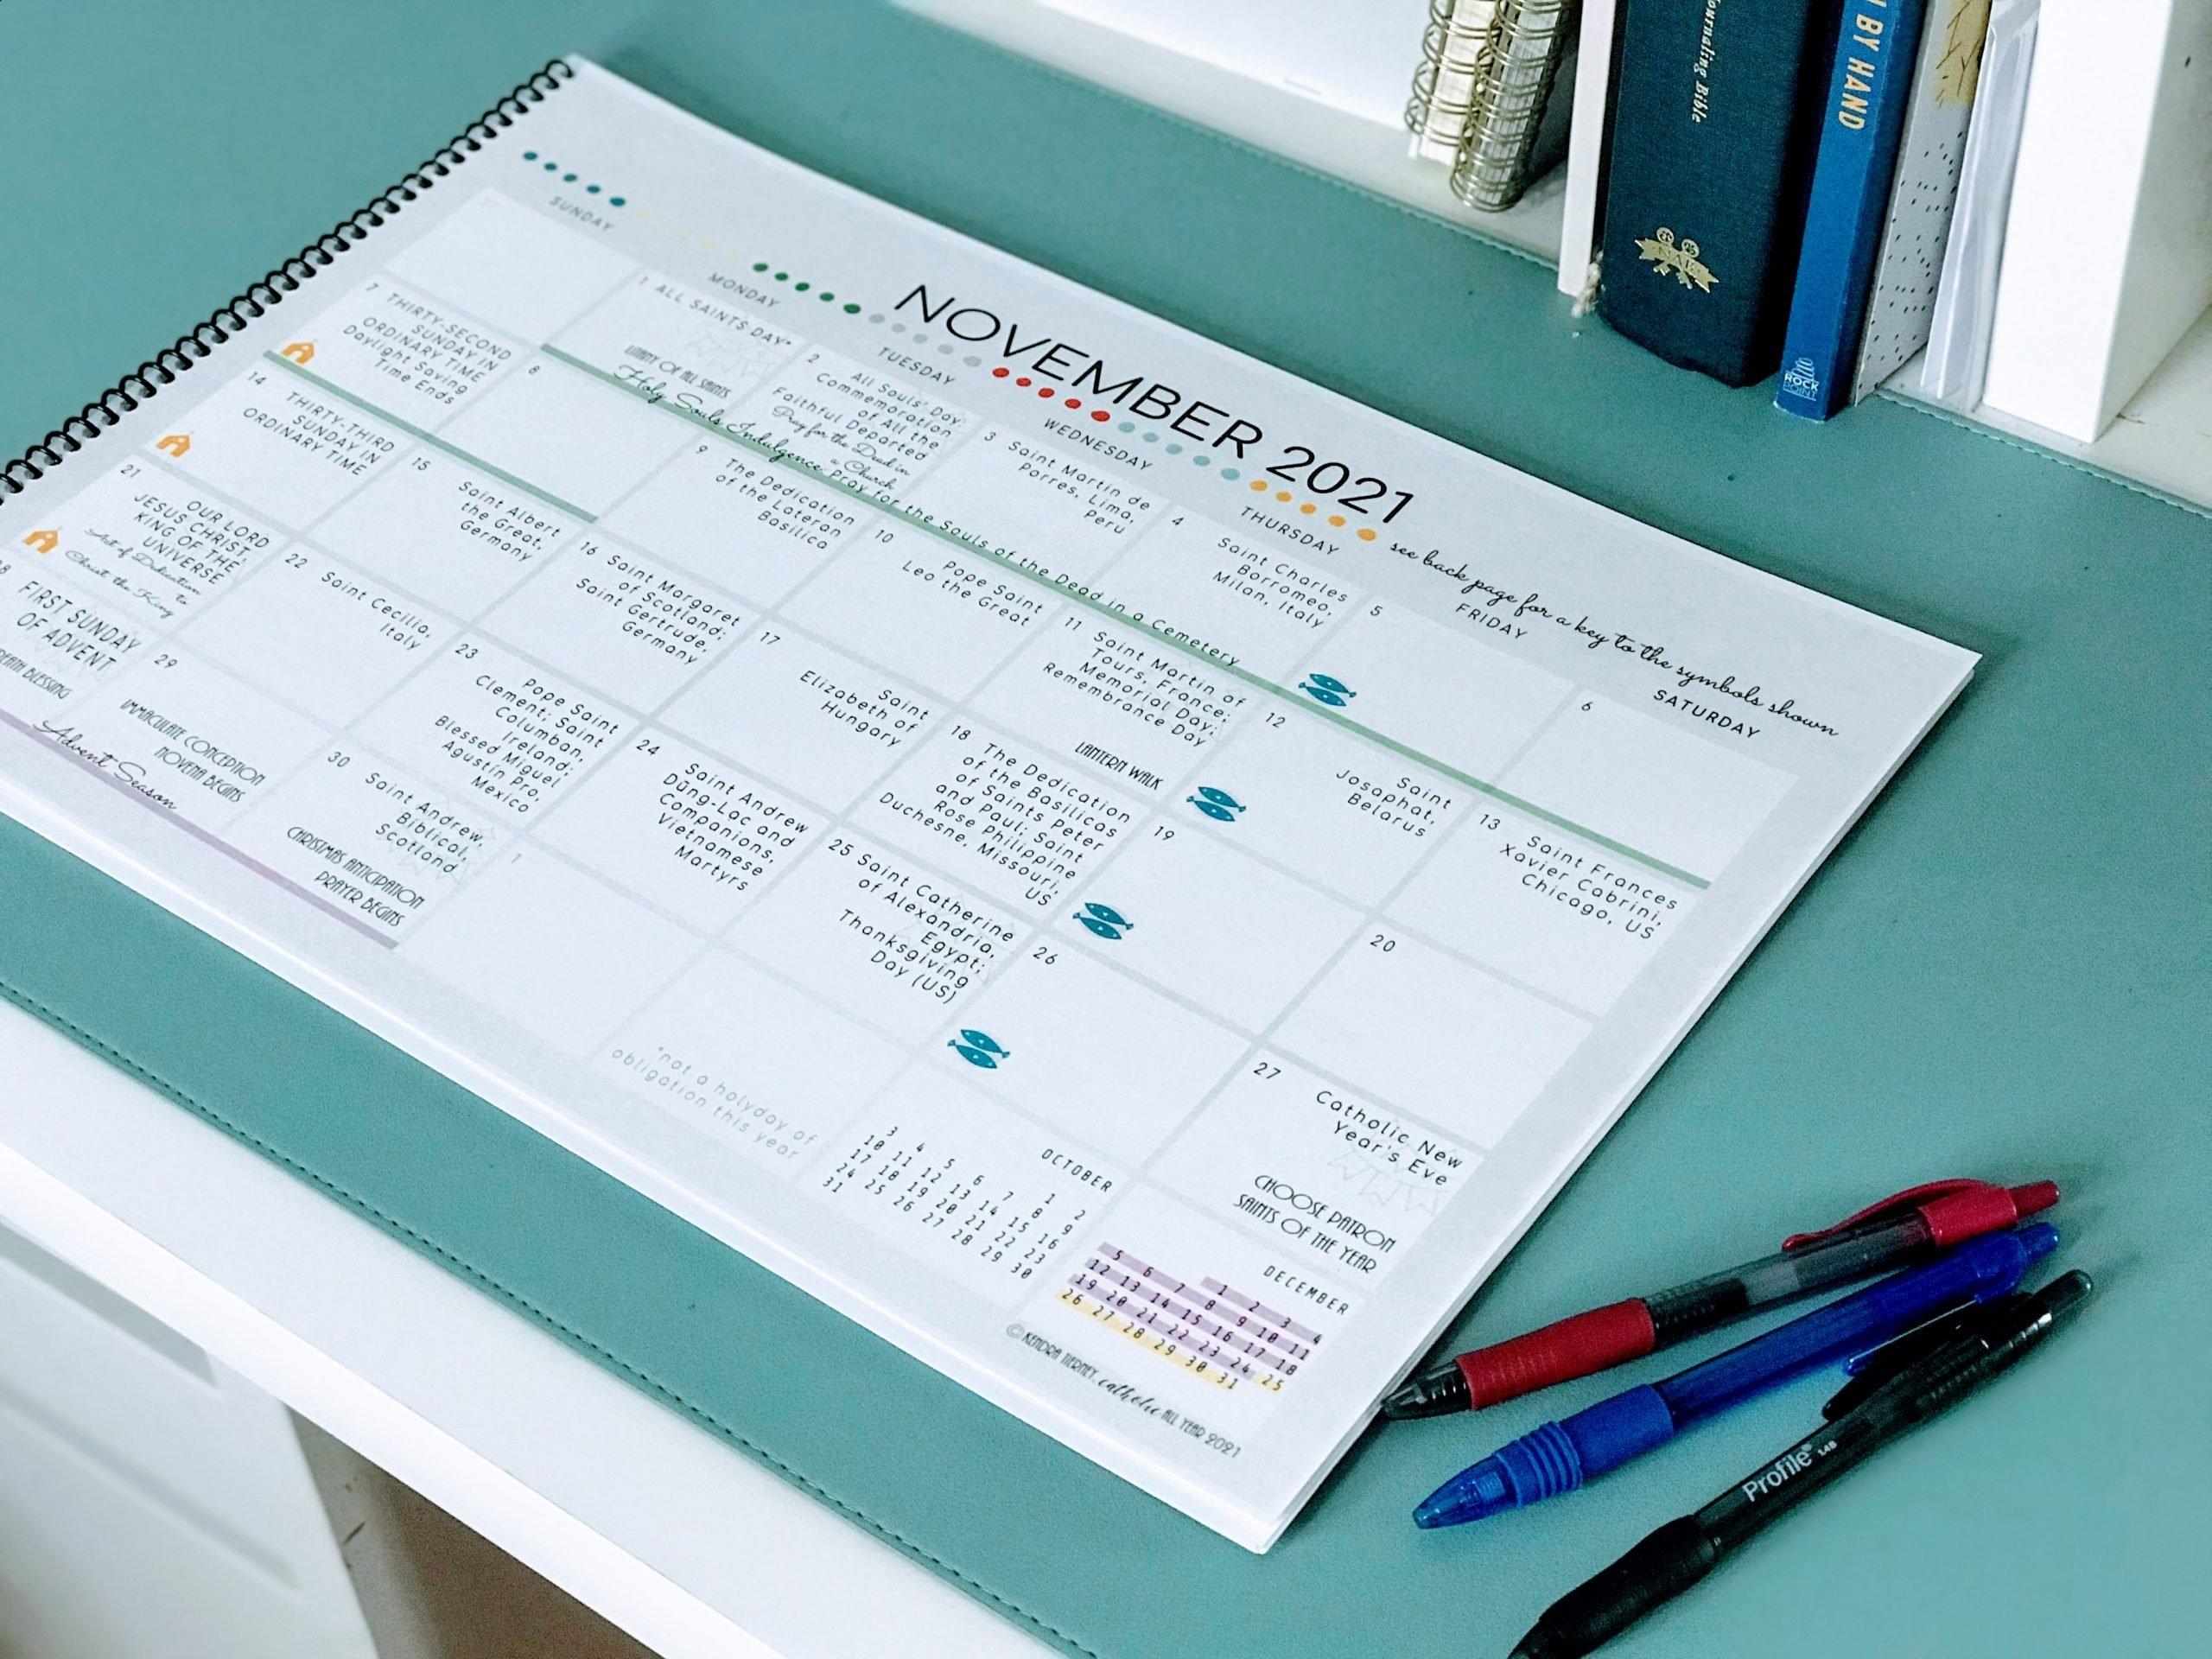 Catholic All Year 2021 Liturgical Desk Calendar Large Format 11X17 *Digital Download* - Catholic throughout Church Calendar 2021 Psd